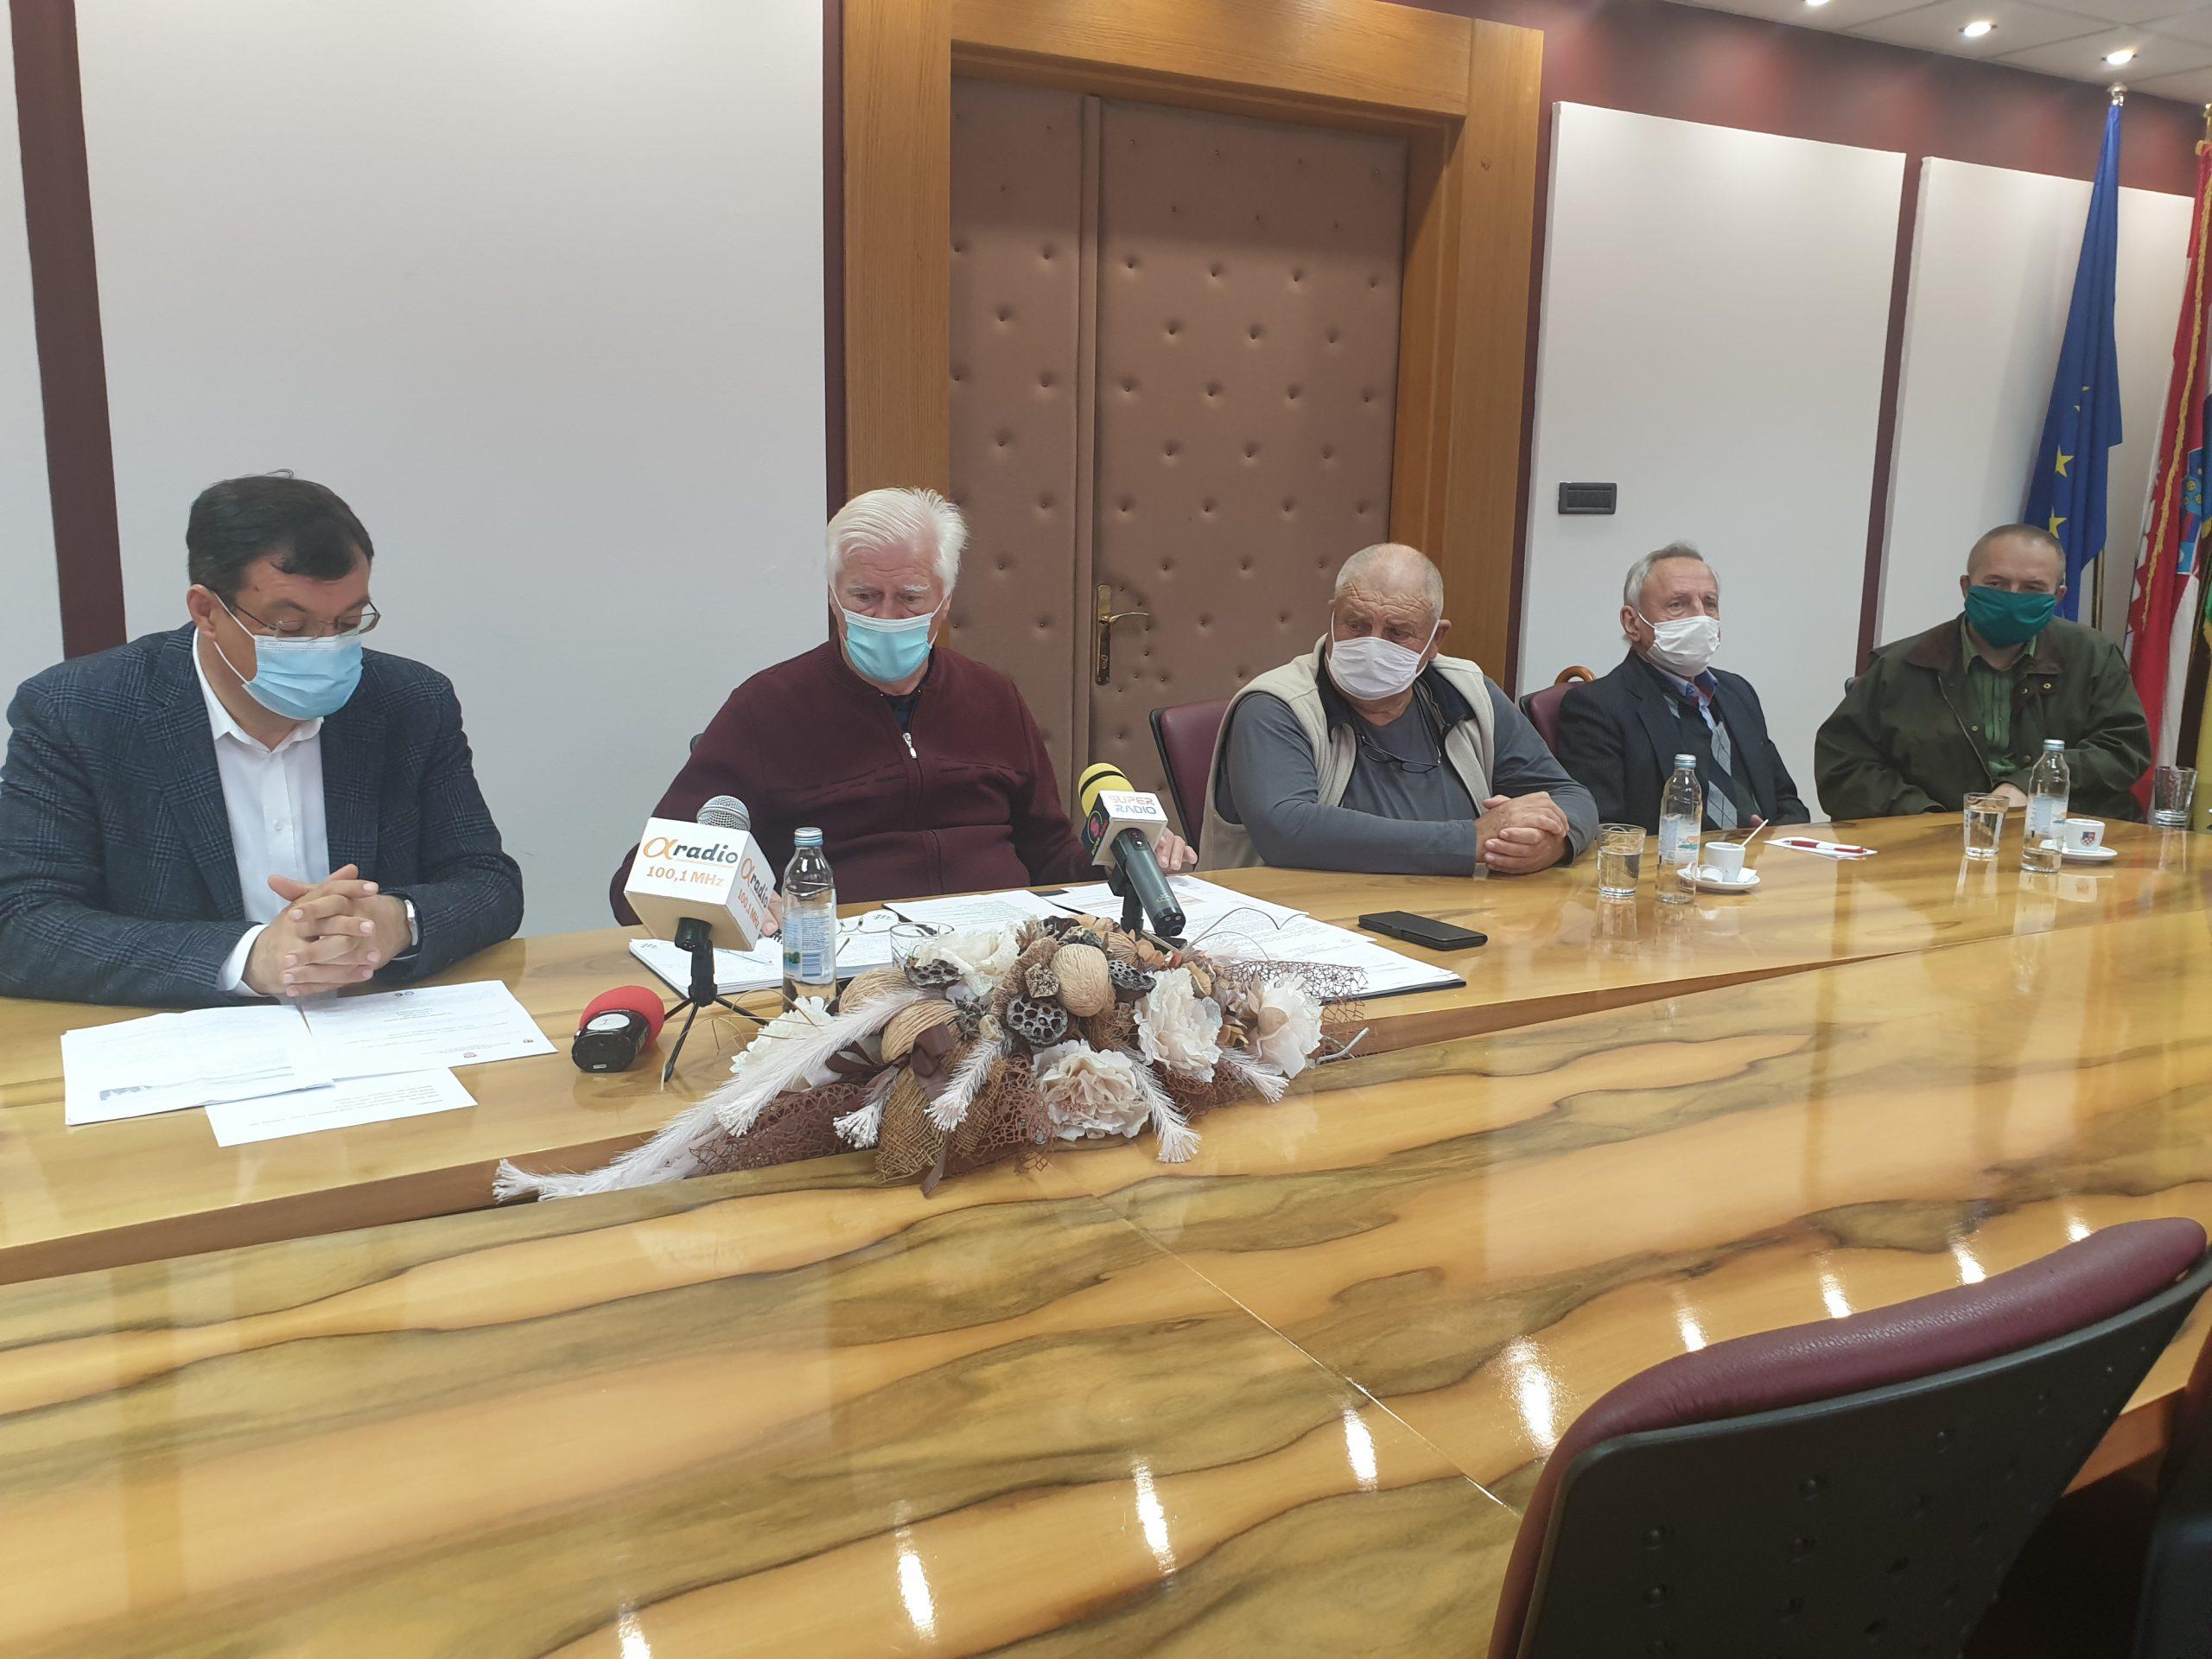 Bajs obećao financijsku i drugu potporu za obnovu partizanskih spomenika